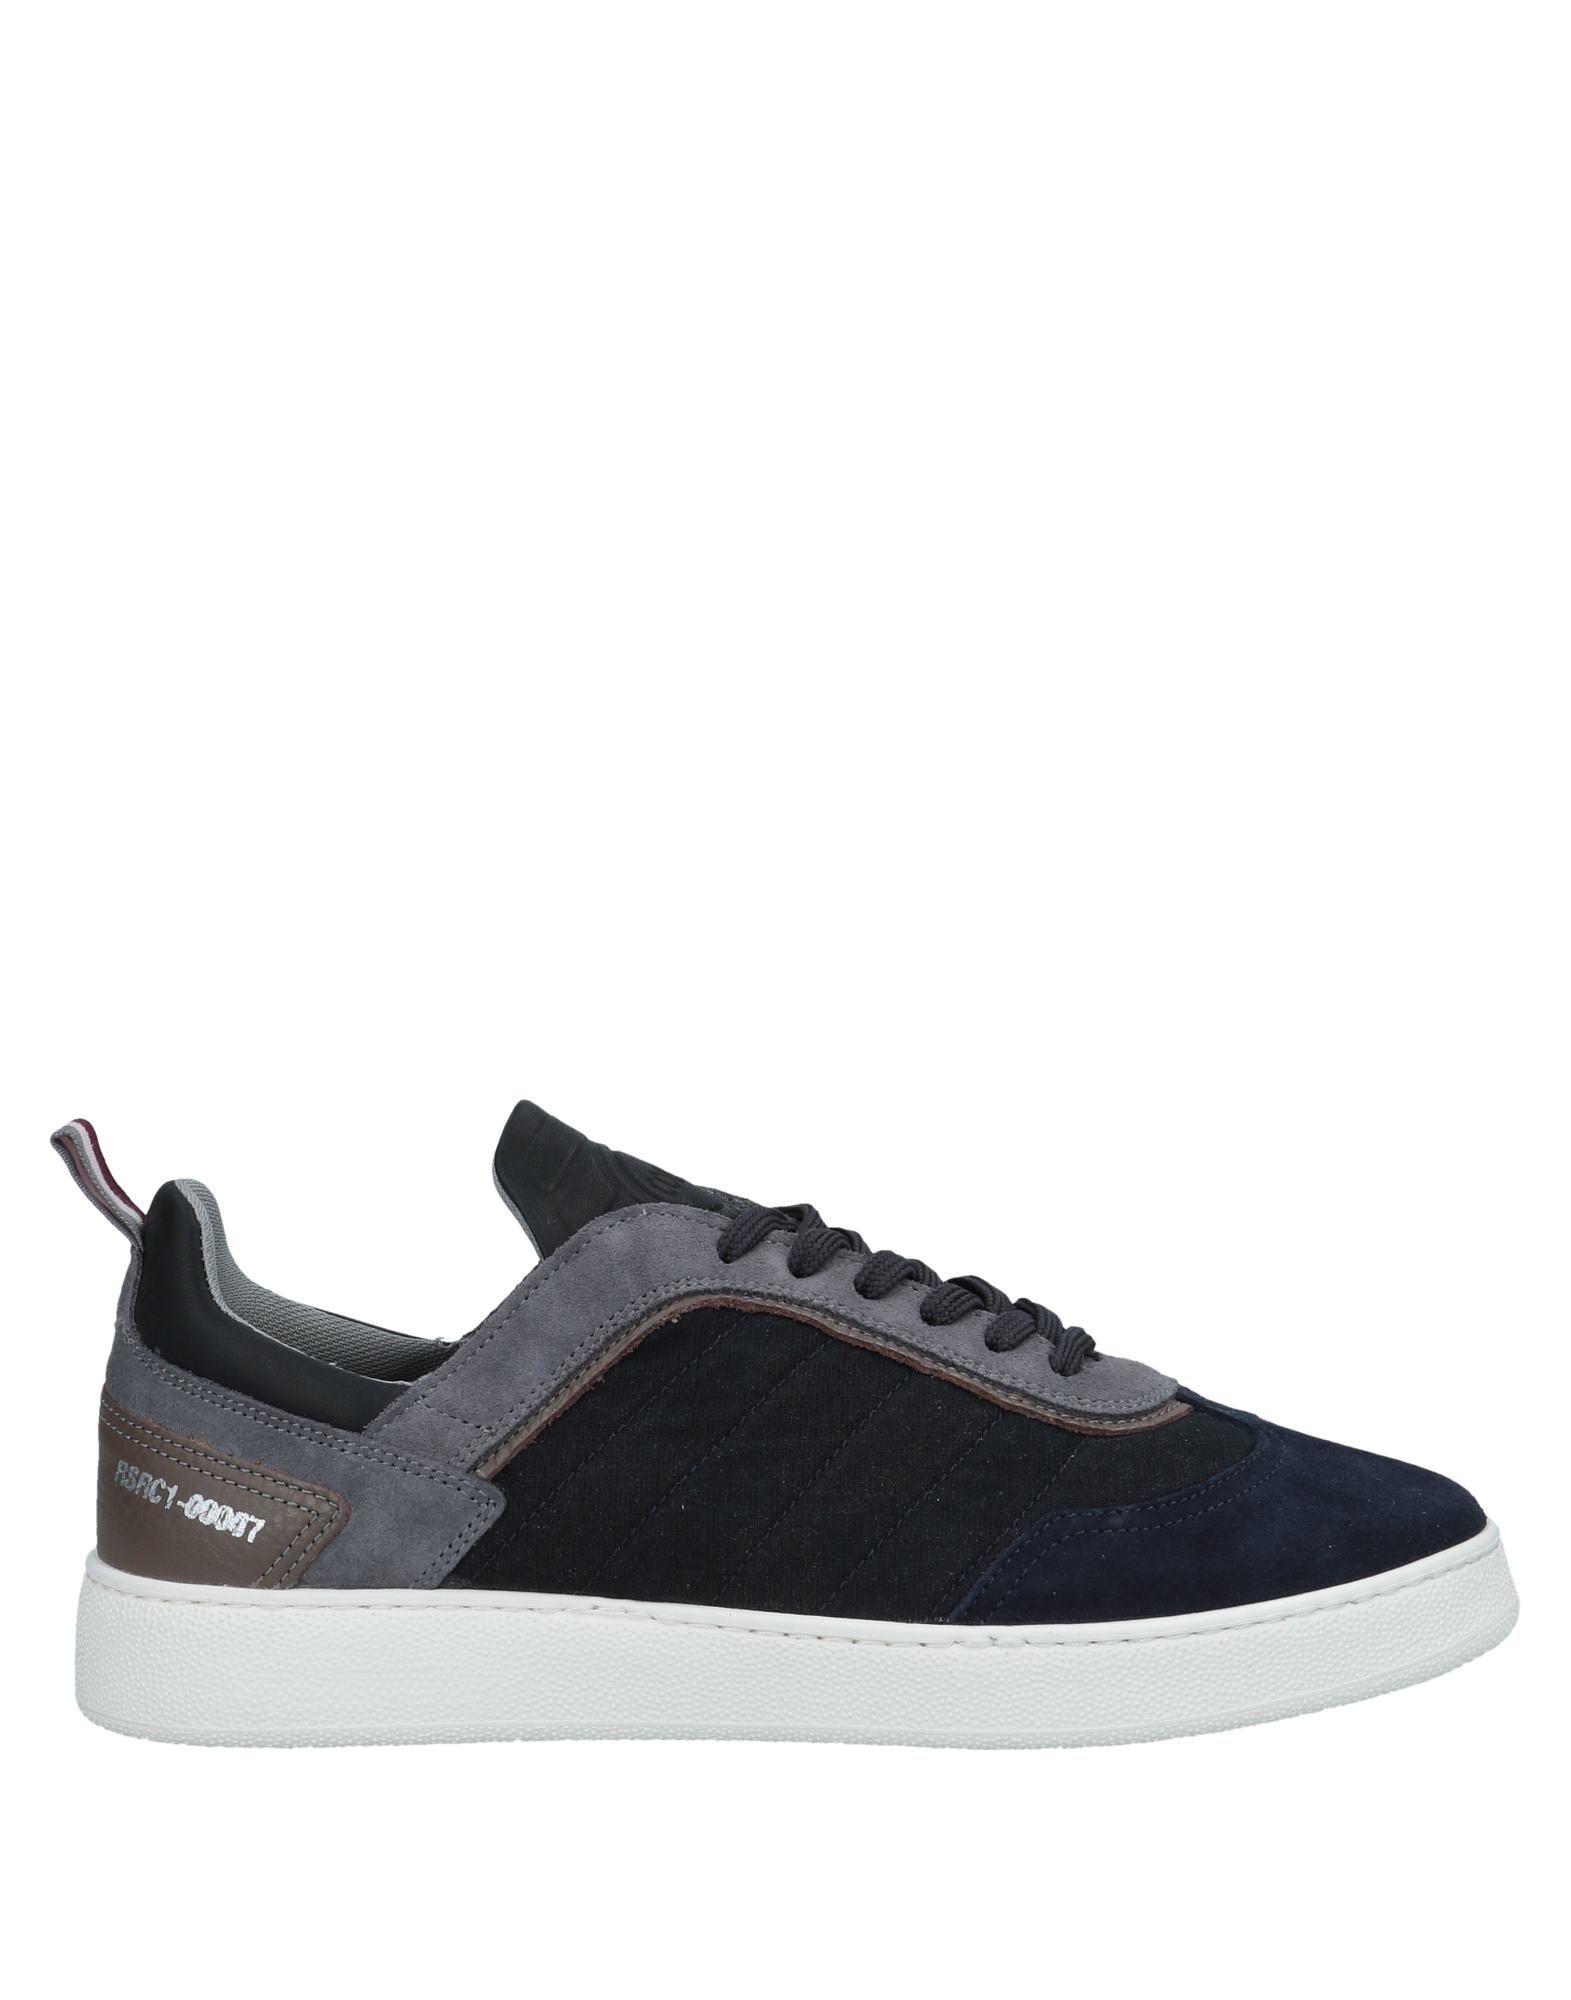 Sneakers Colmar Uomo - 11552485XC elegante